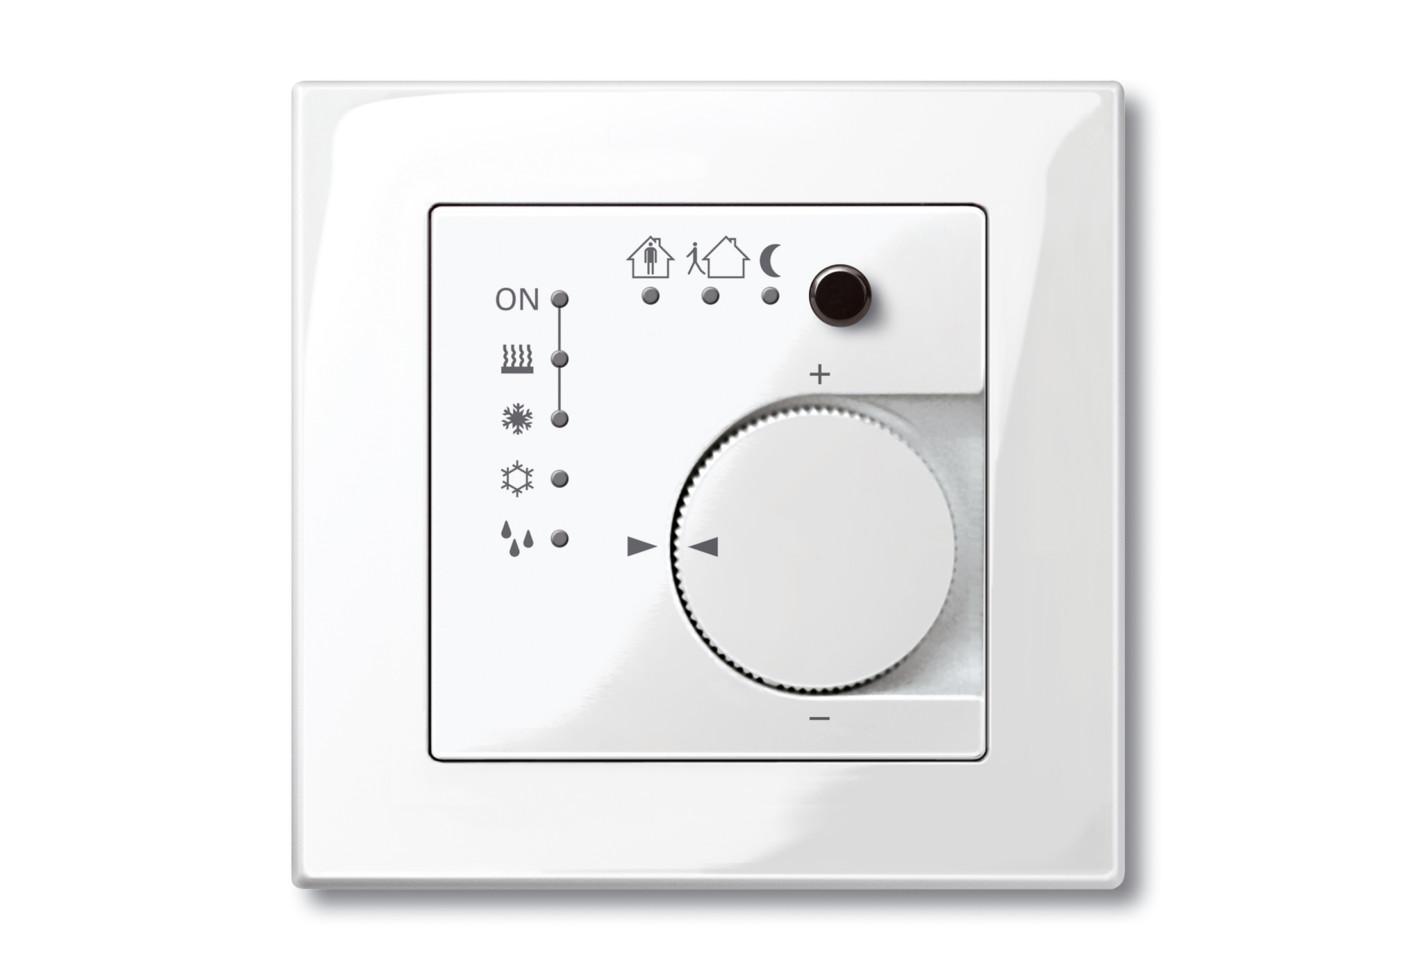 KNX room temperature control by Merten STYLEPARK #2B2624